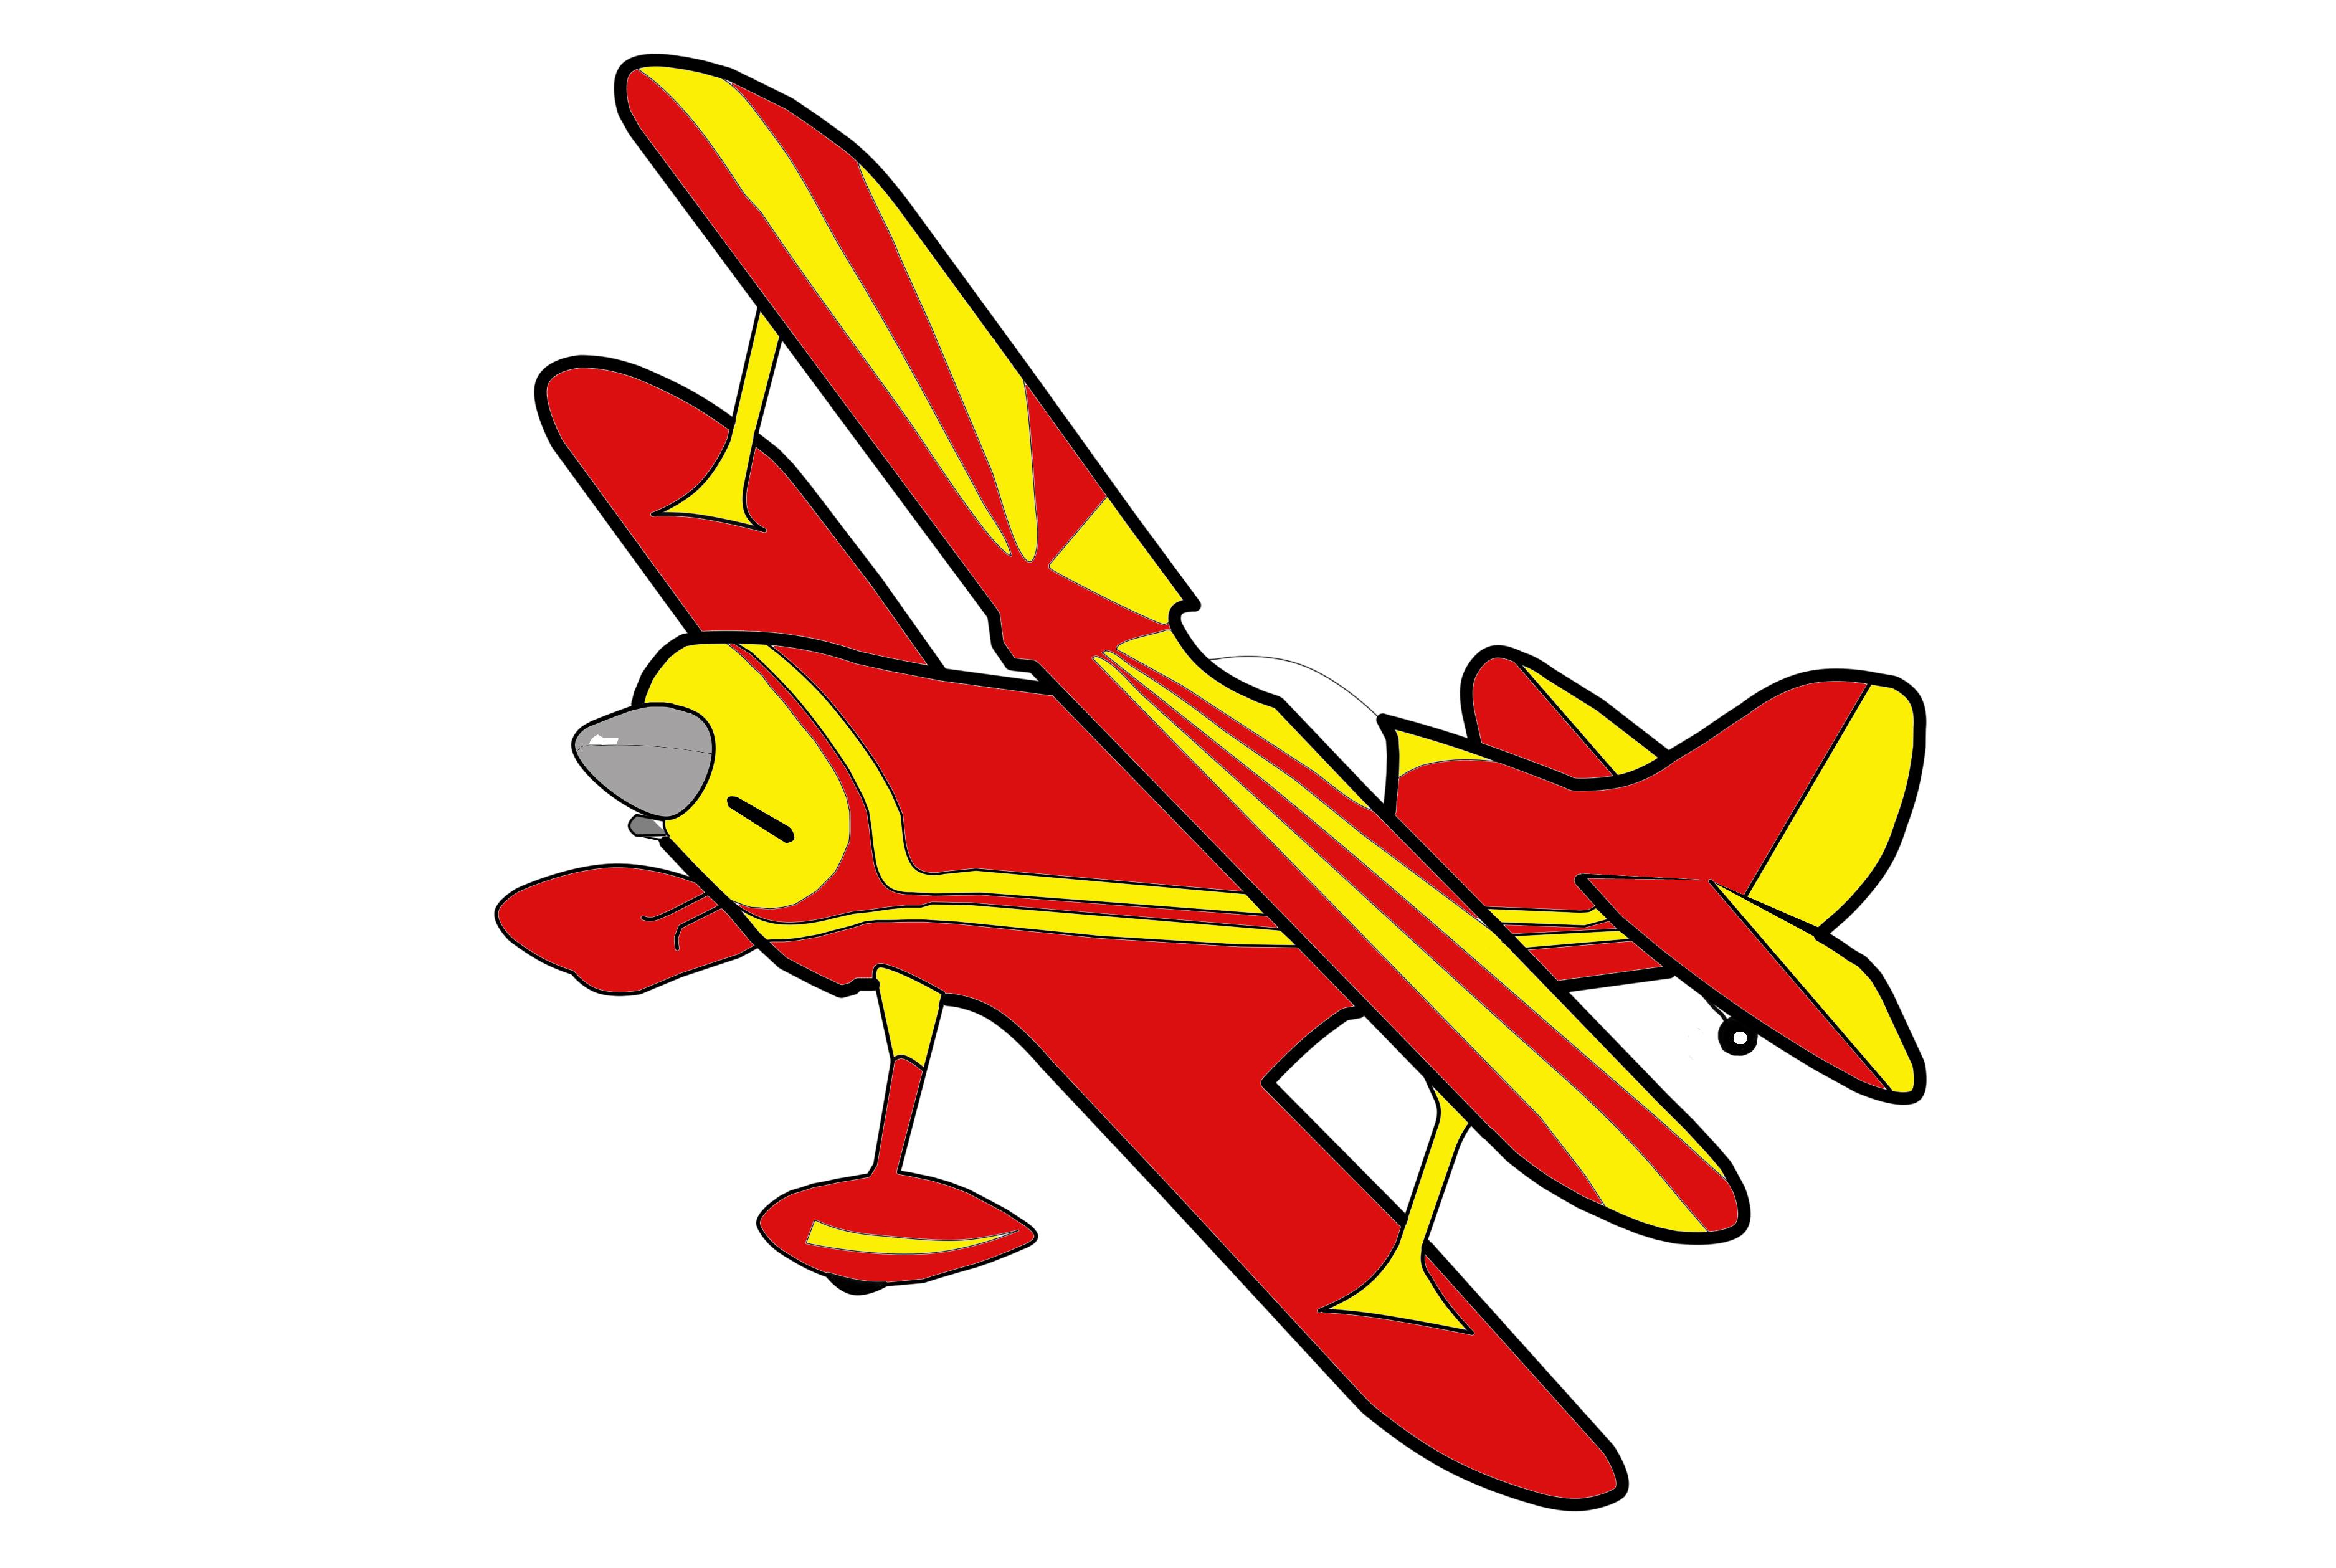 Biplane Clipart-Biplane Clipart-3